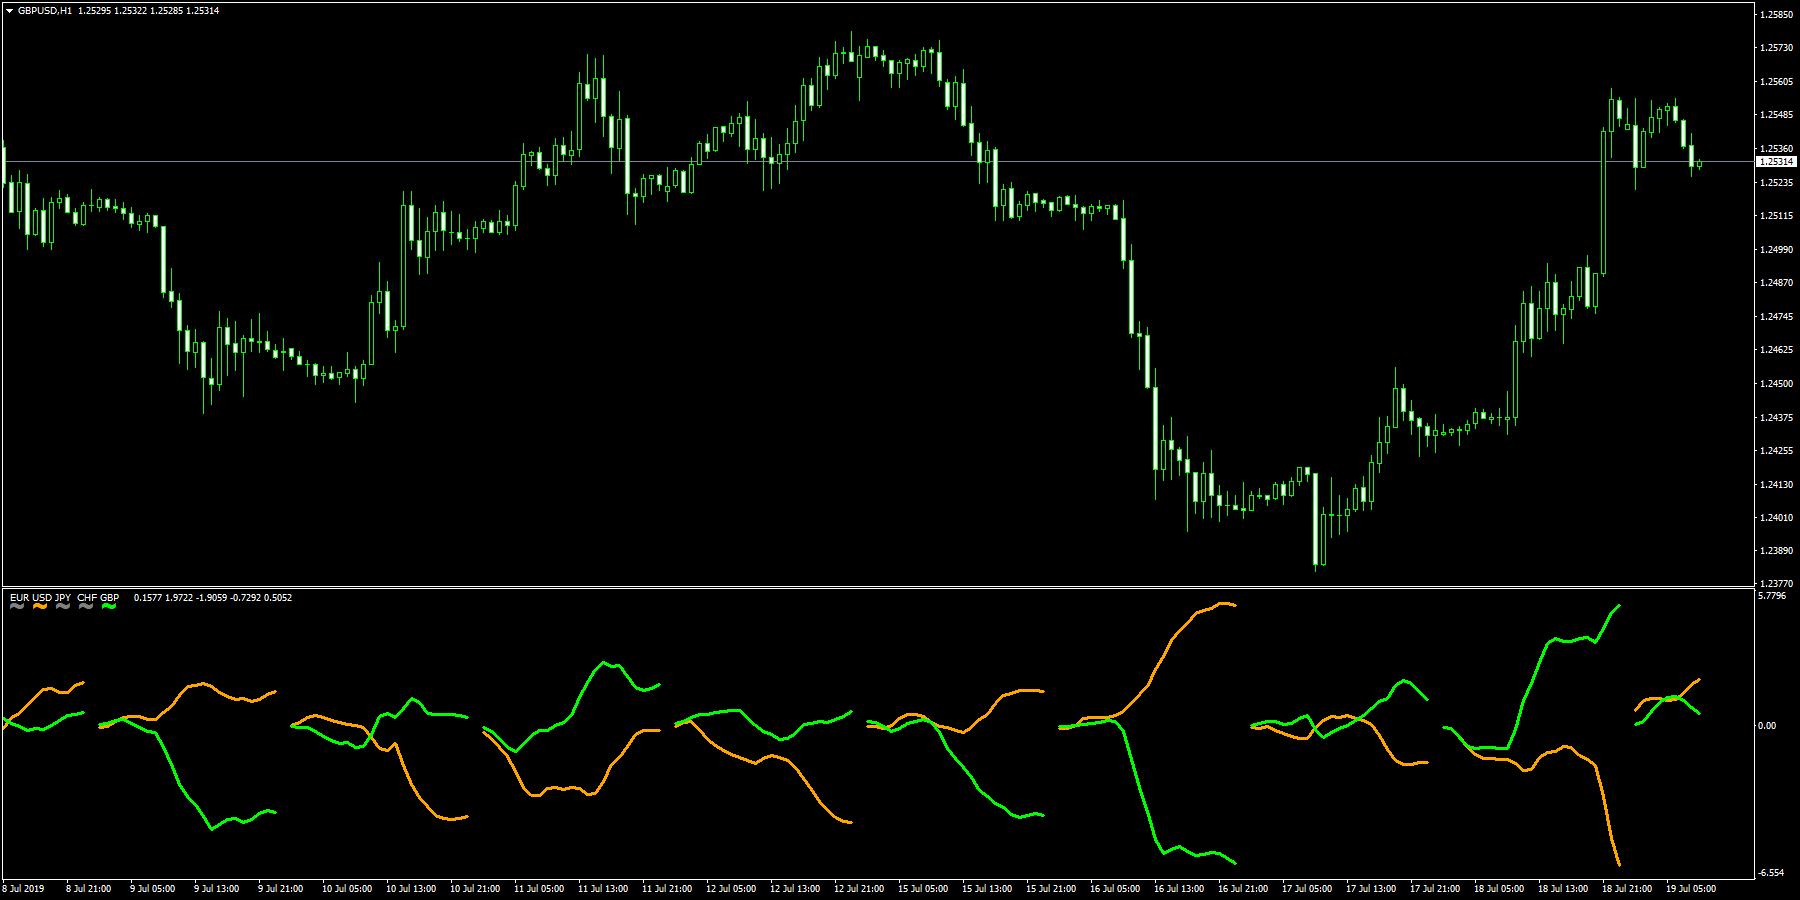 Ku-chartZ [1時間足] チャート上の通貨のみの強弱ライン